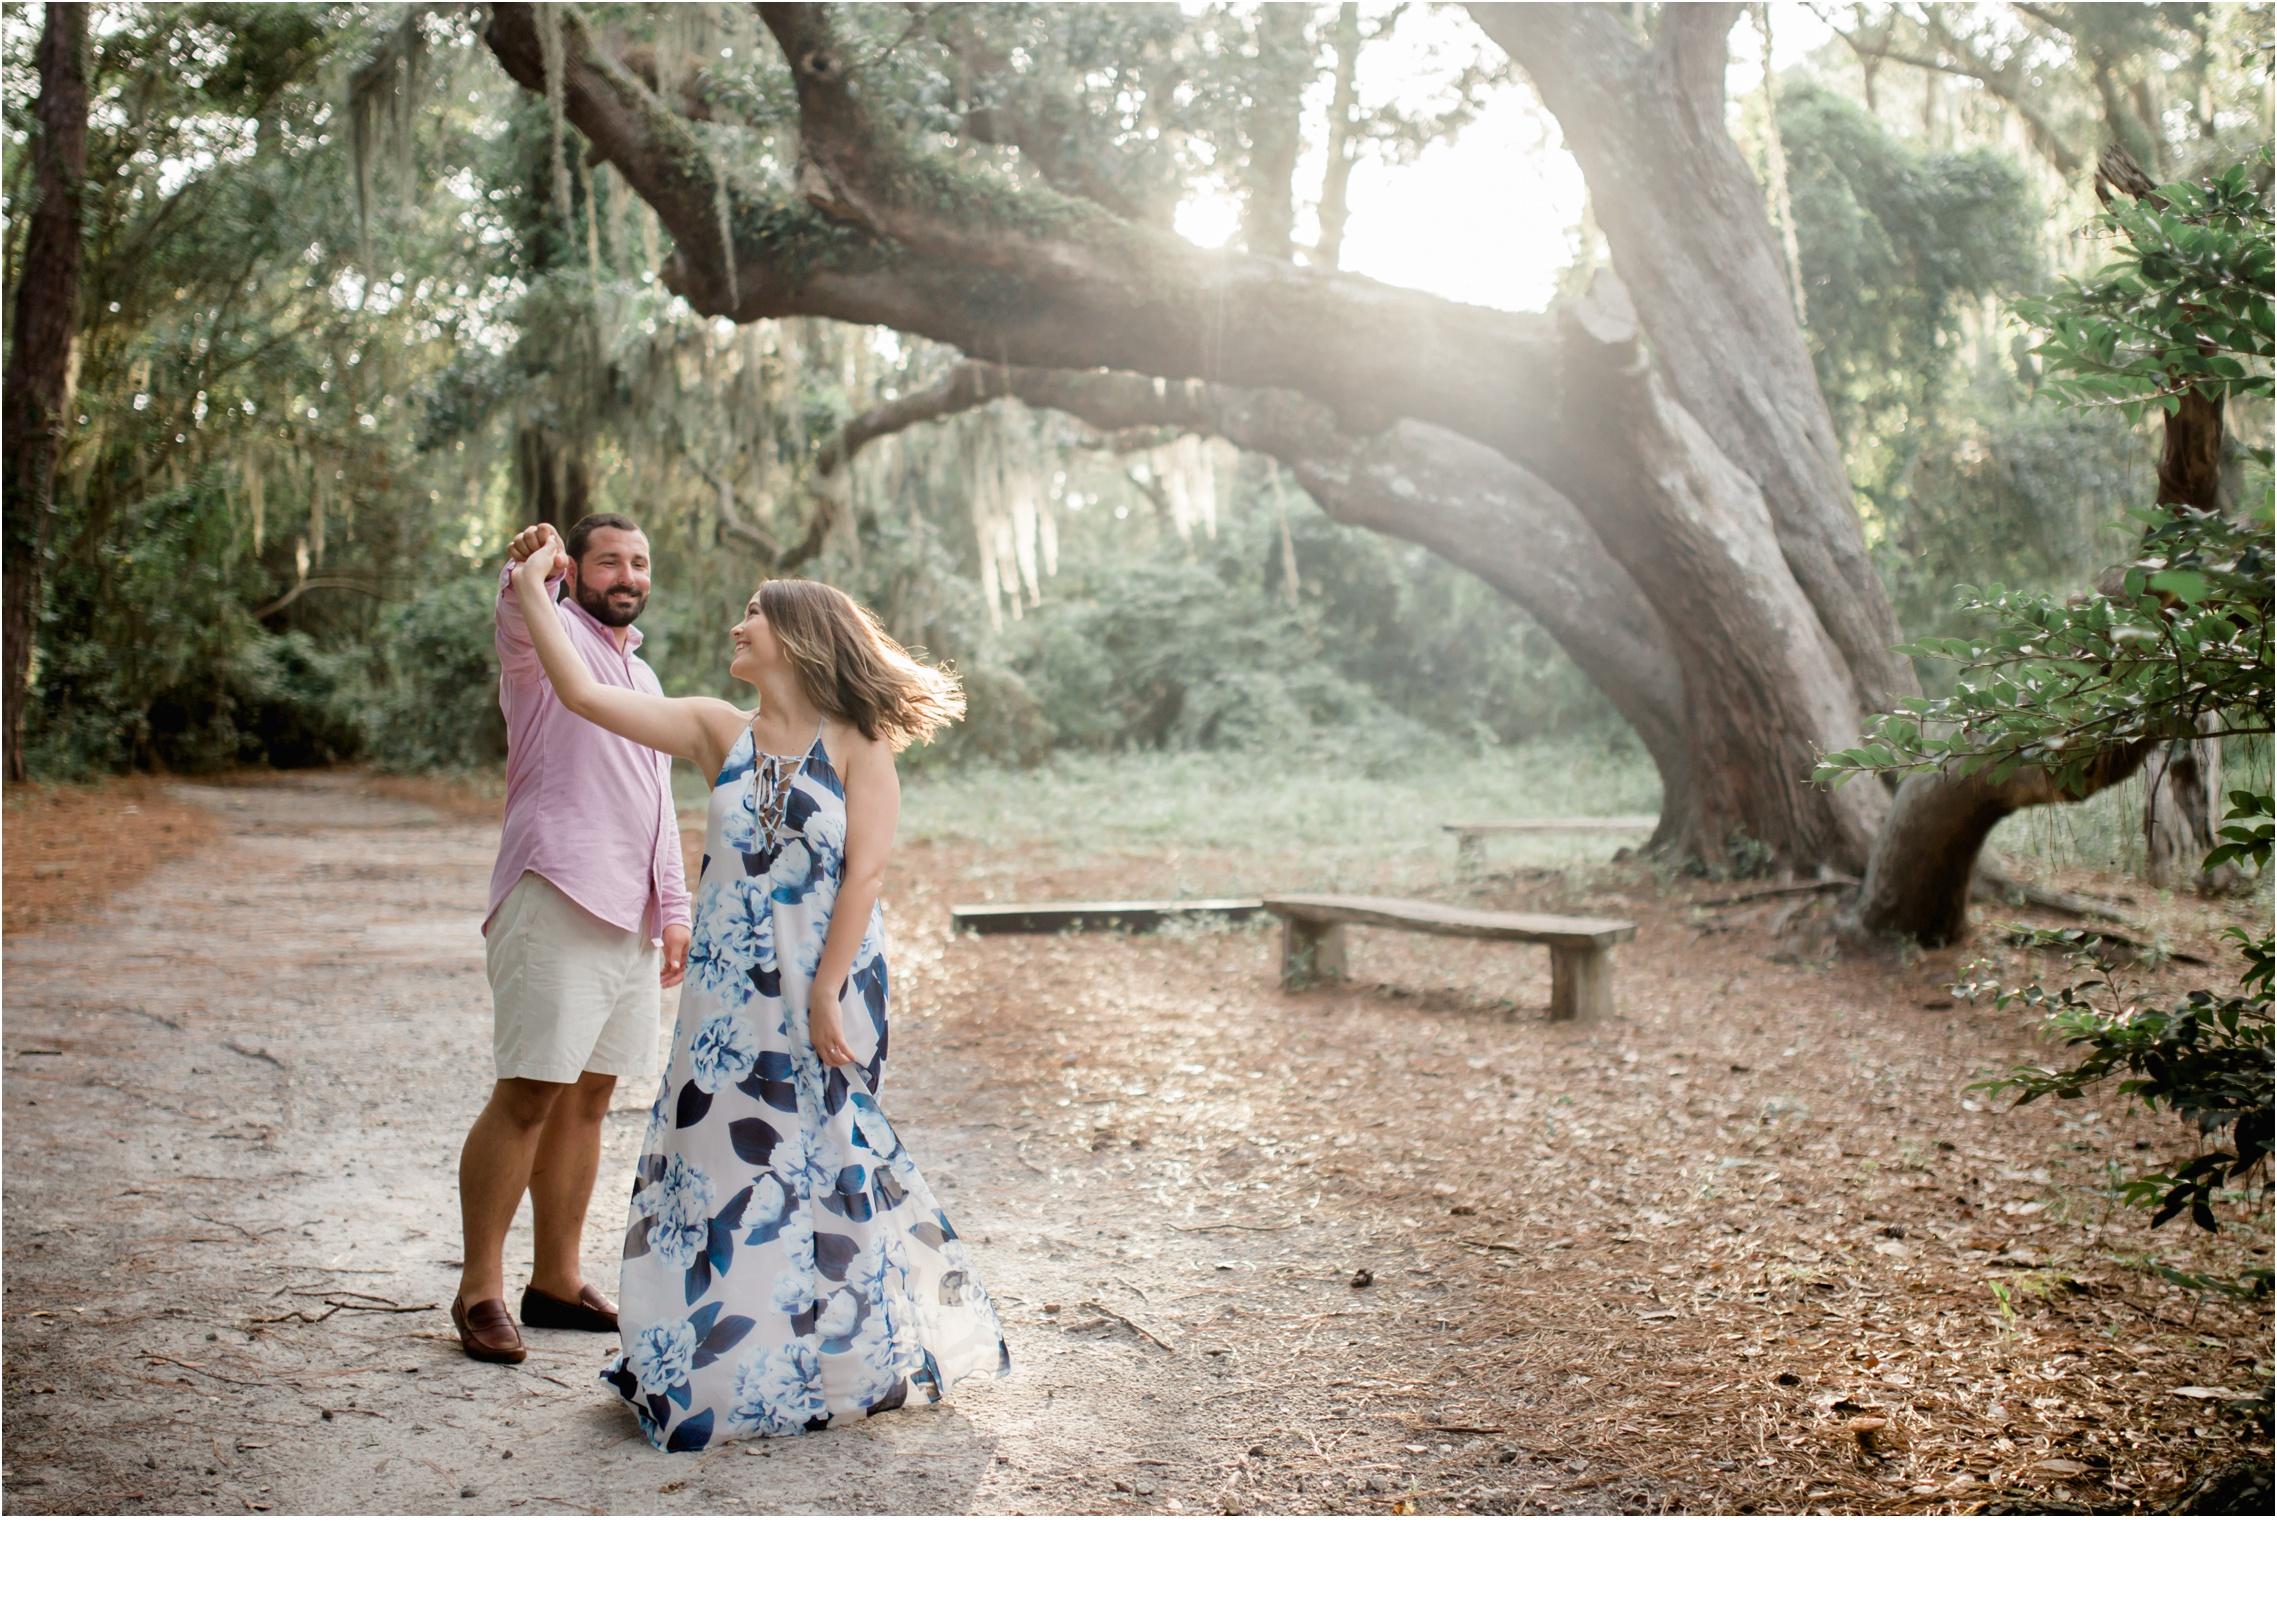 Rainey_Gregg_Photography_St._Simons_Island_Georgia_California_Wedding_Portrait_Photography_0153.jpg